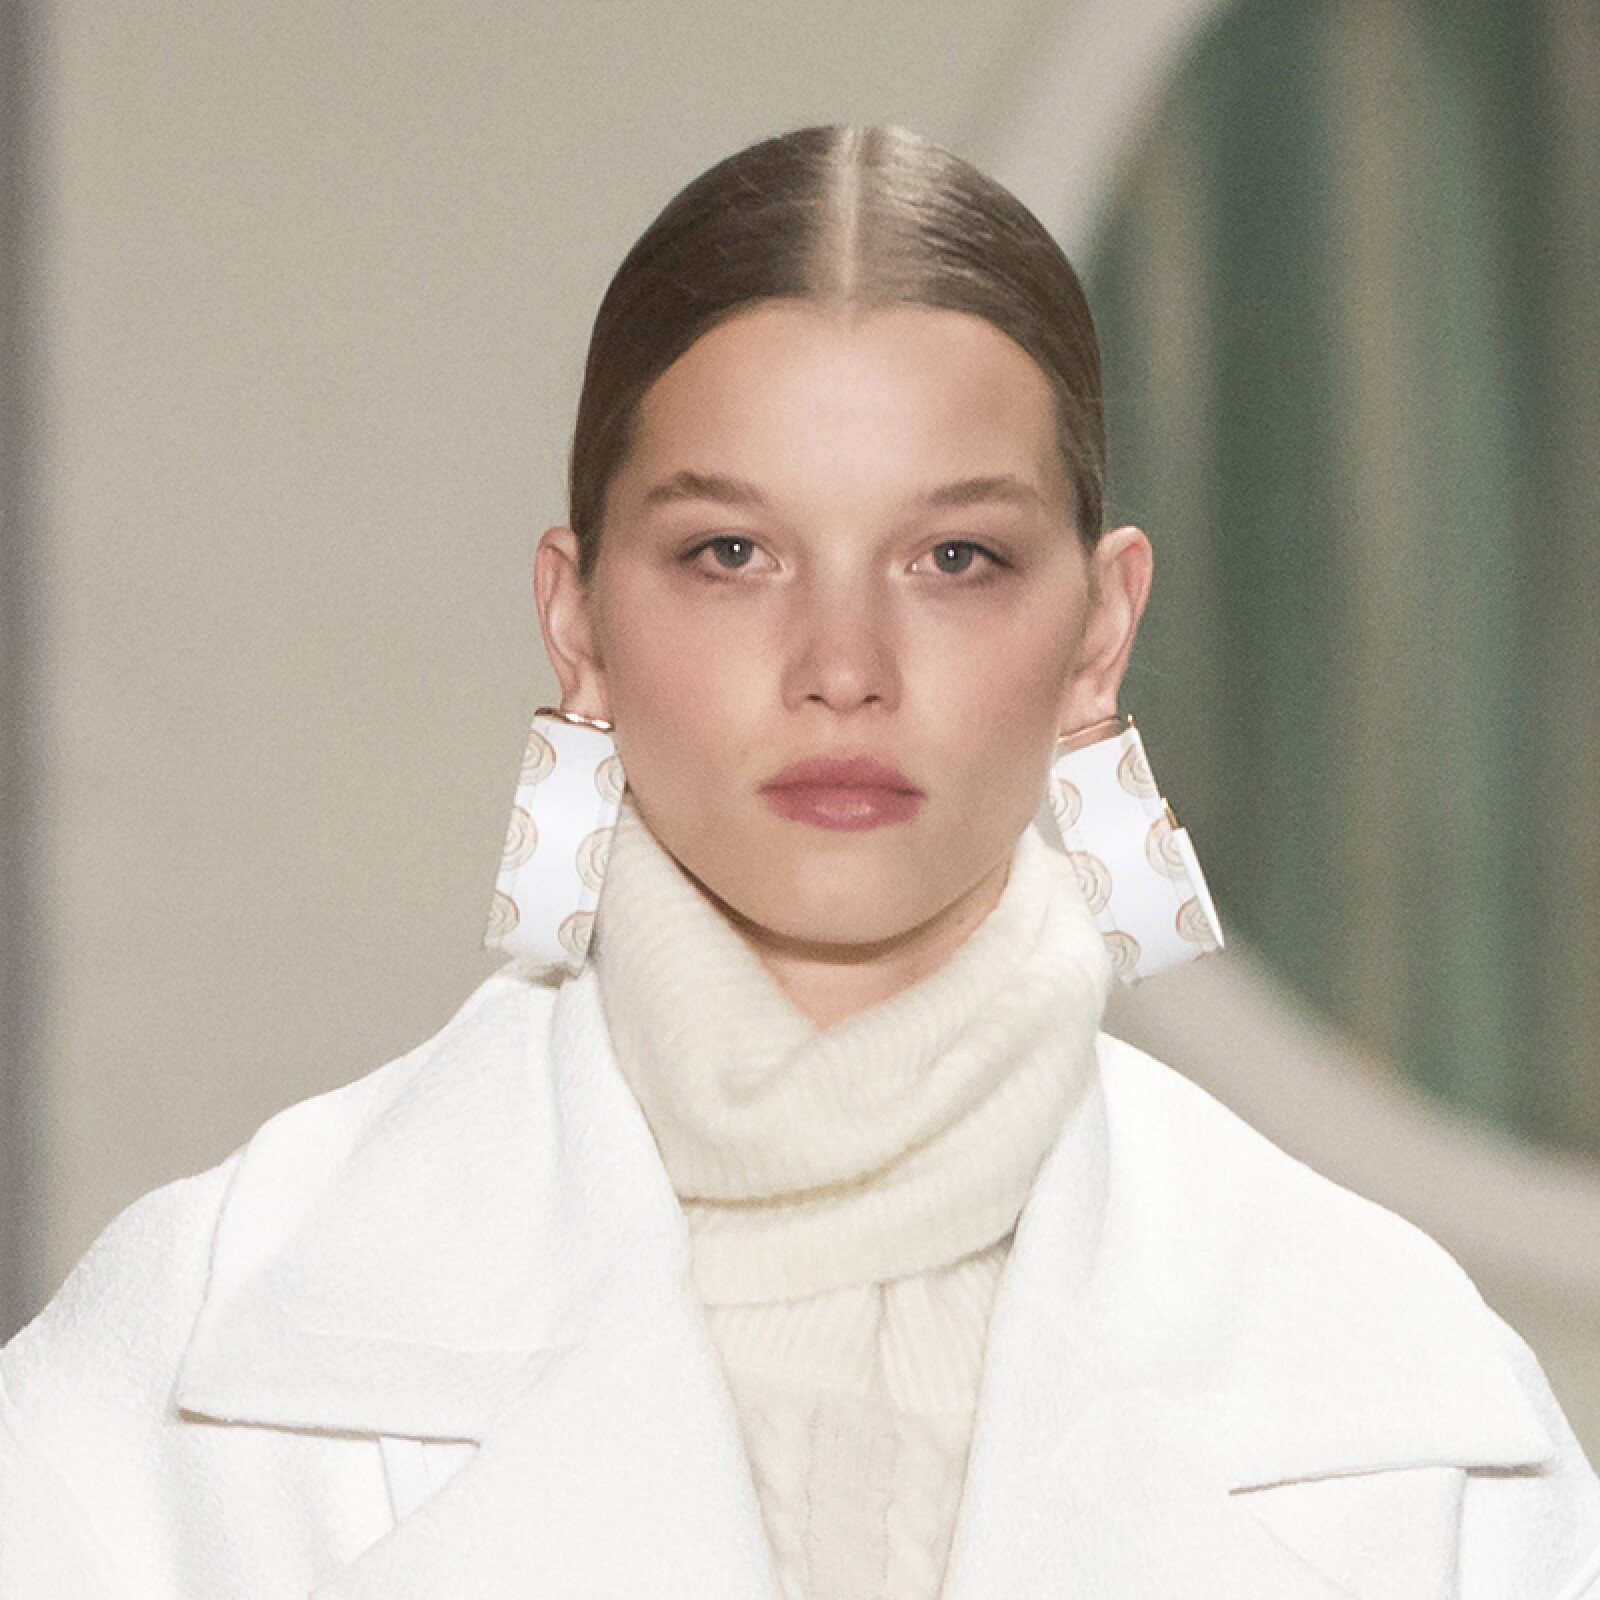 PFW-Paris Fashion Week-Runway-Pasarela-Beauty Look-Belleza-Jacquemus